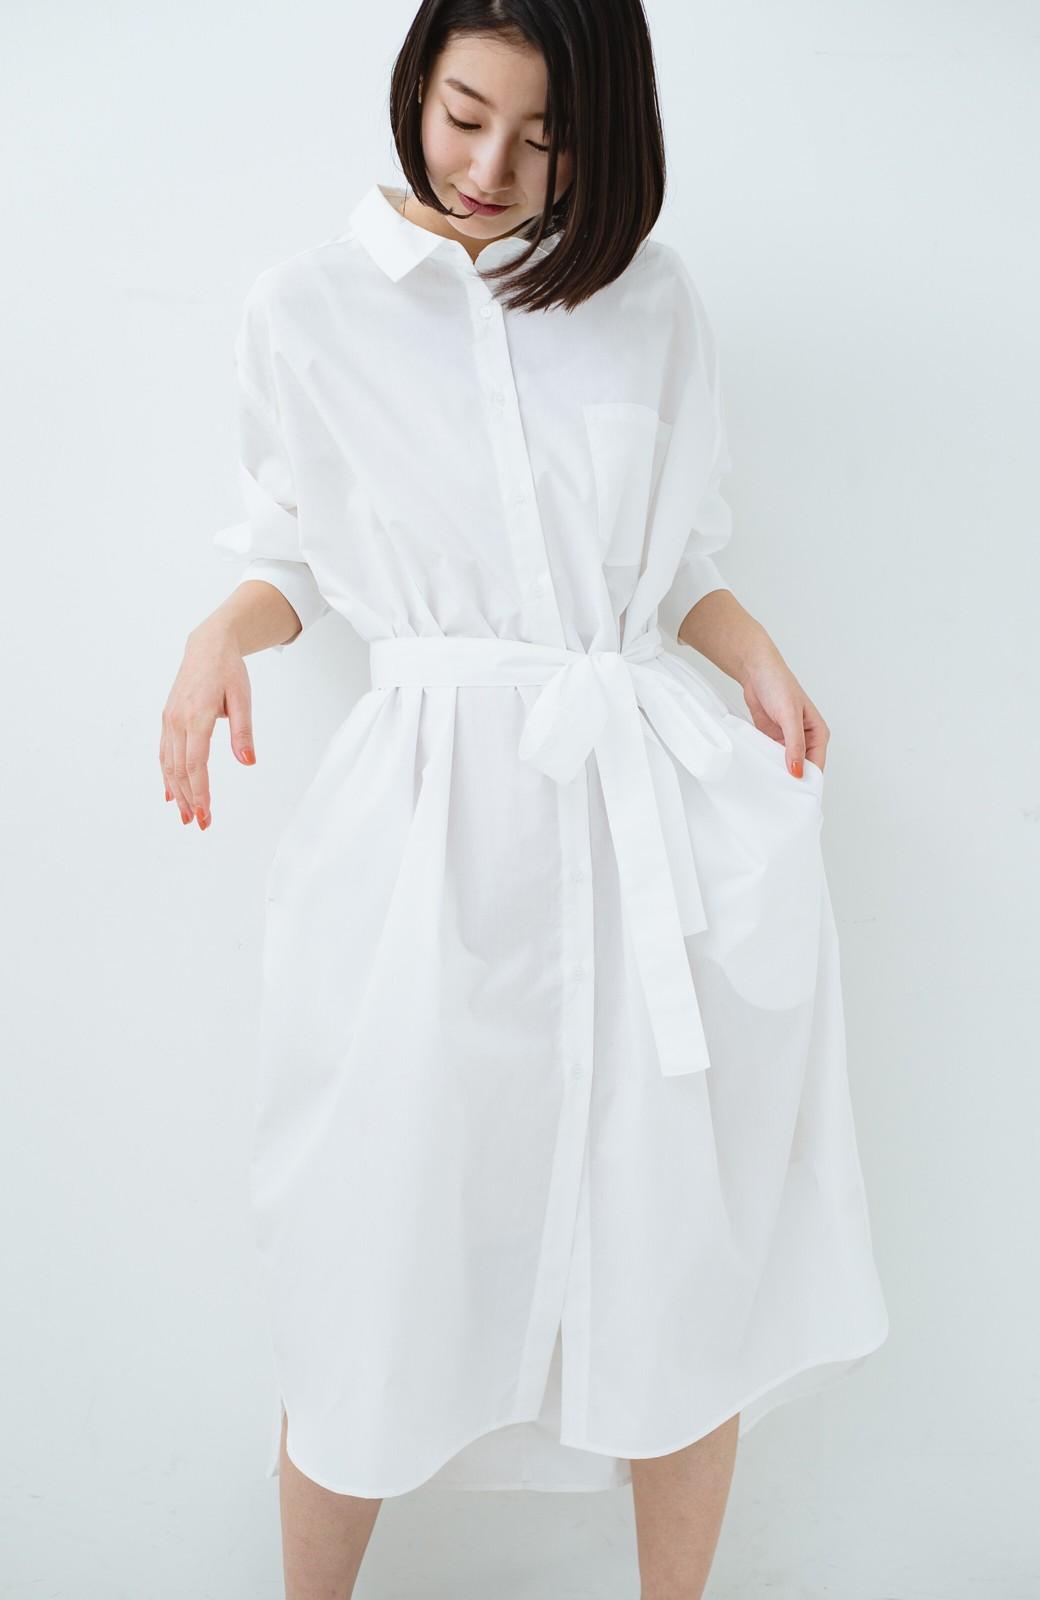 haco! 気持ちが凛と改まる リボン付きオーバーサイズシャツワンピース <ホワイト>の商品写真25